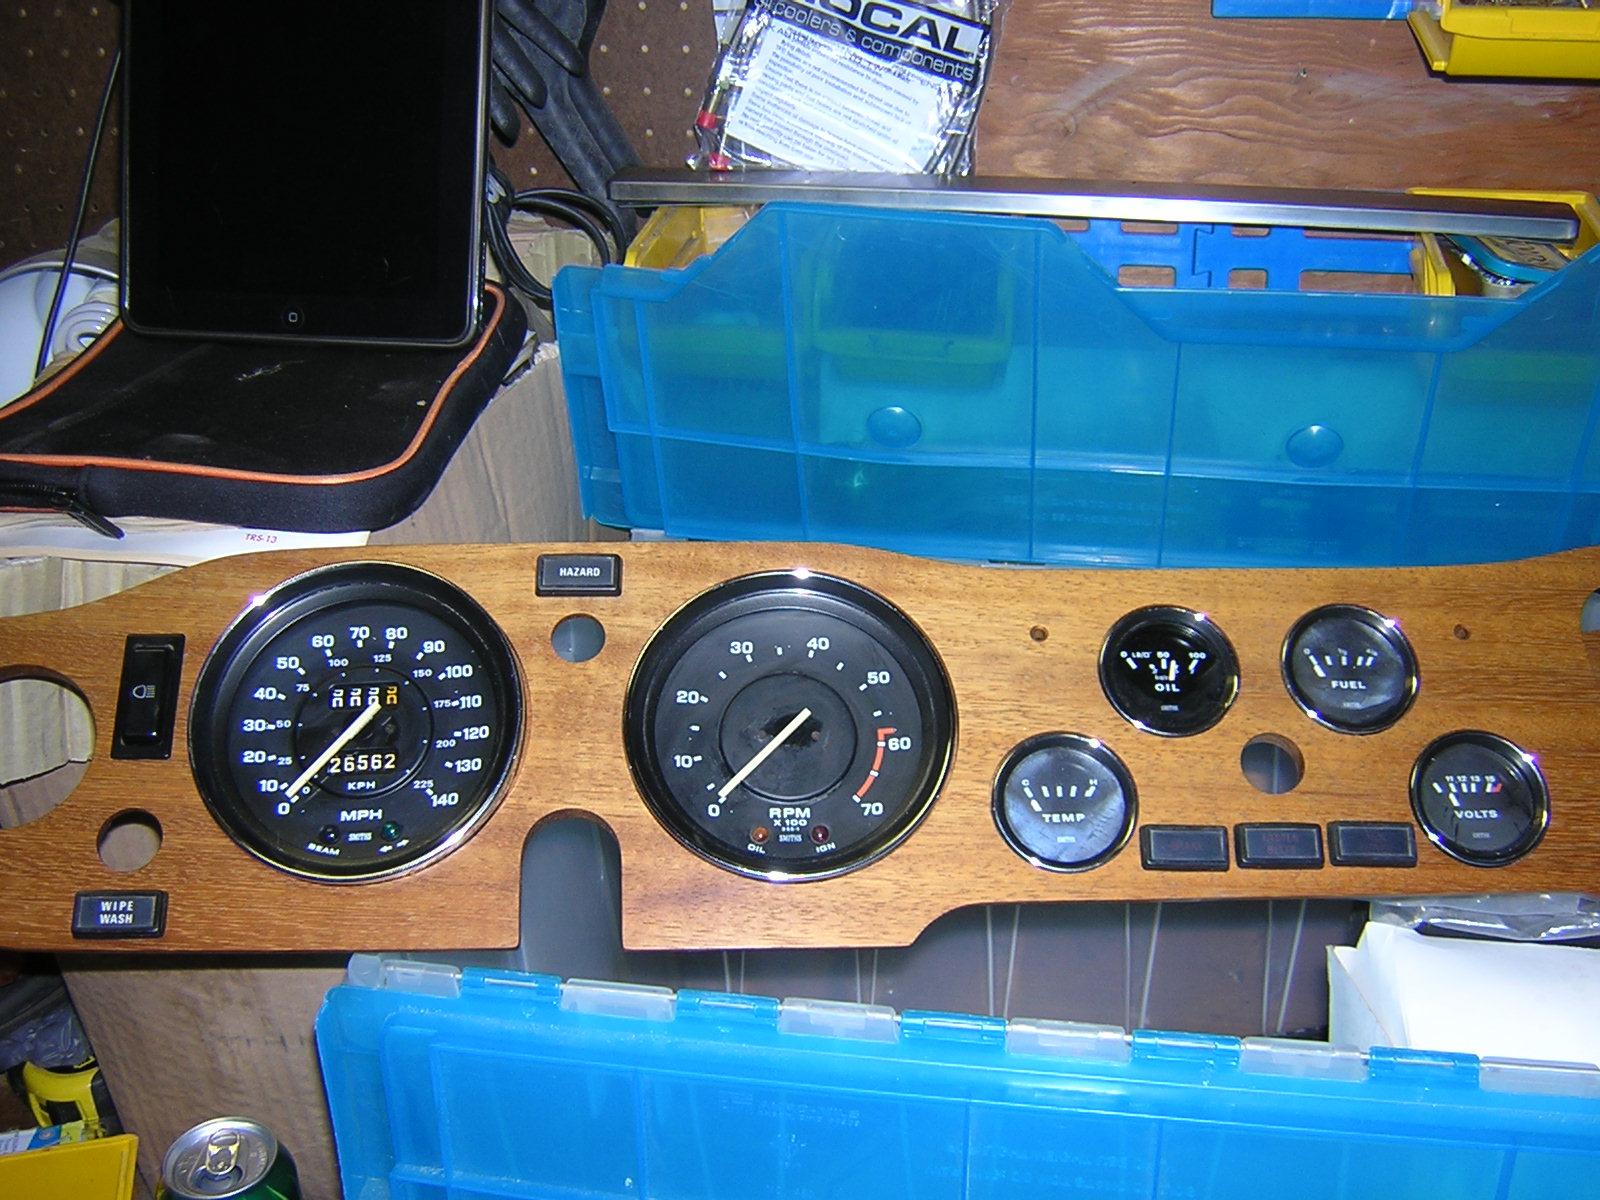 1969 triumph gt6 wiring diagram triumph wiring diagrams complete car